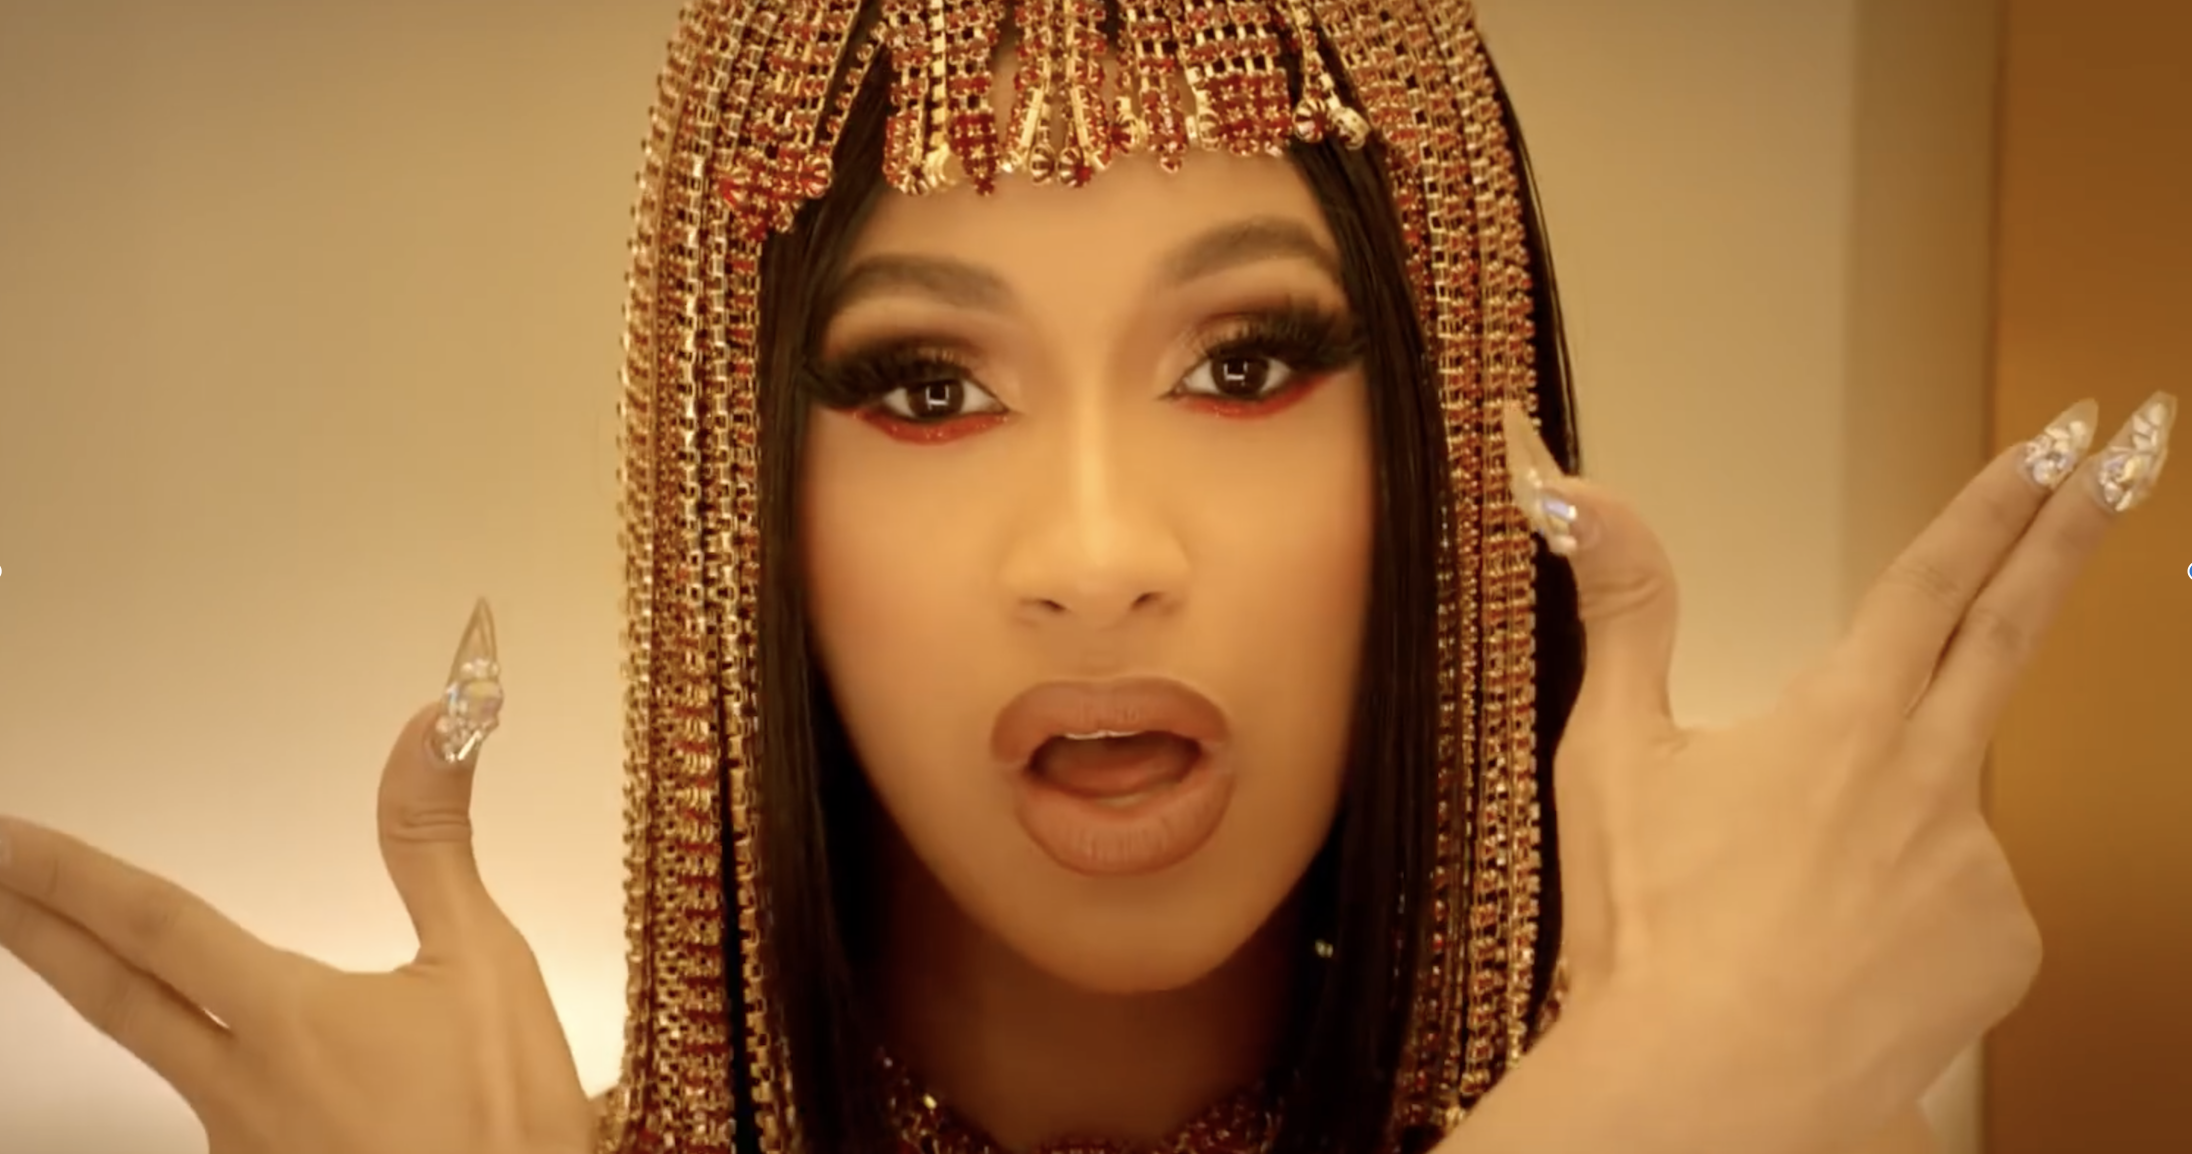 Cardi B Money: Cardi B Offers 2018's Biggest Flex In Her Video For 'Money'